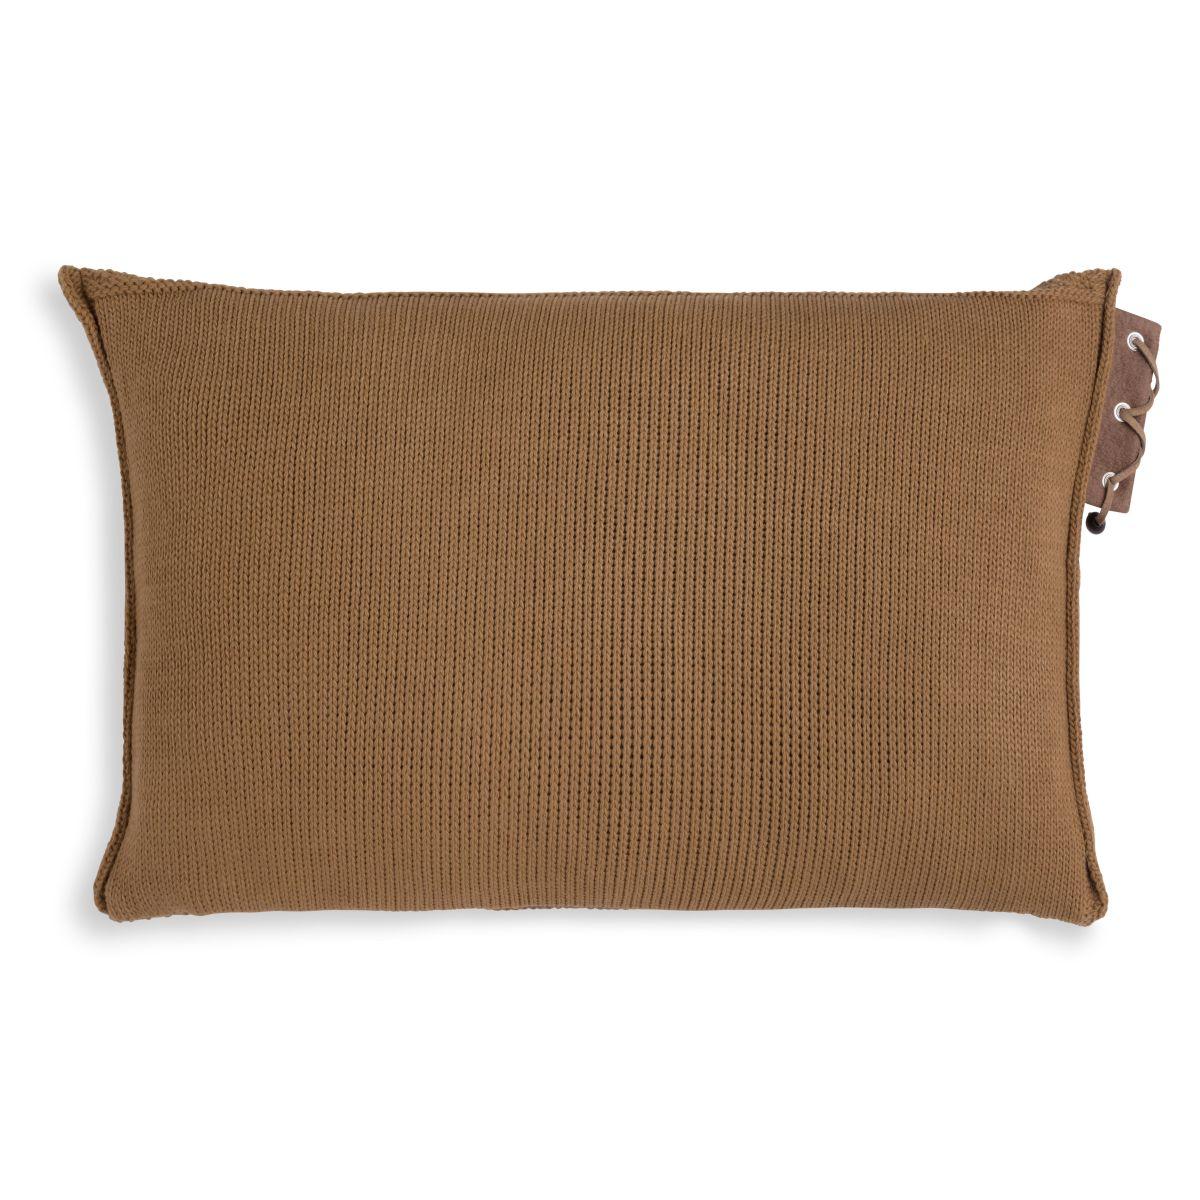 knit factory 1341320 jay kussen 60x40 new camel 2